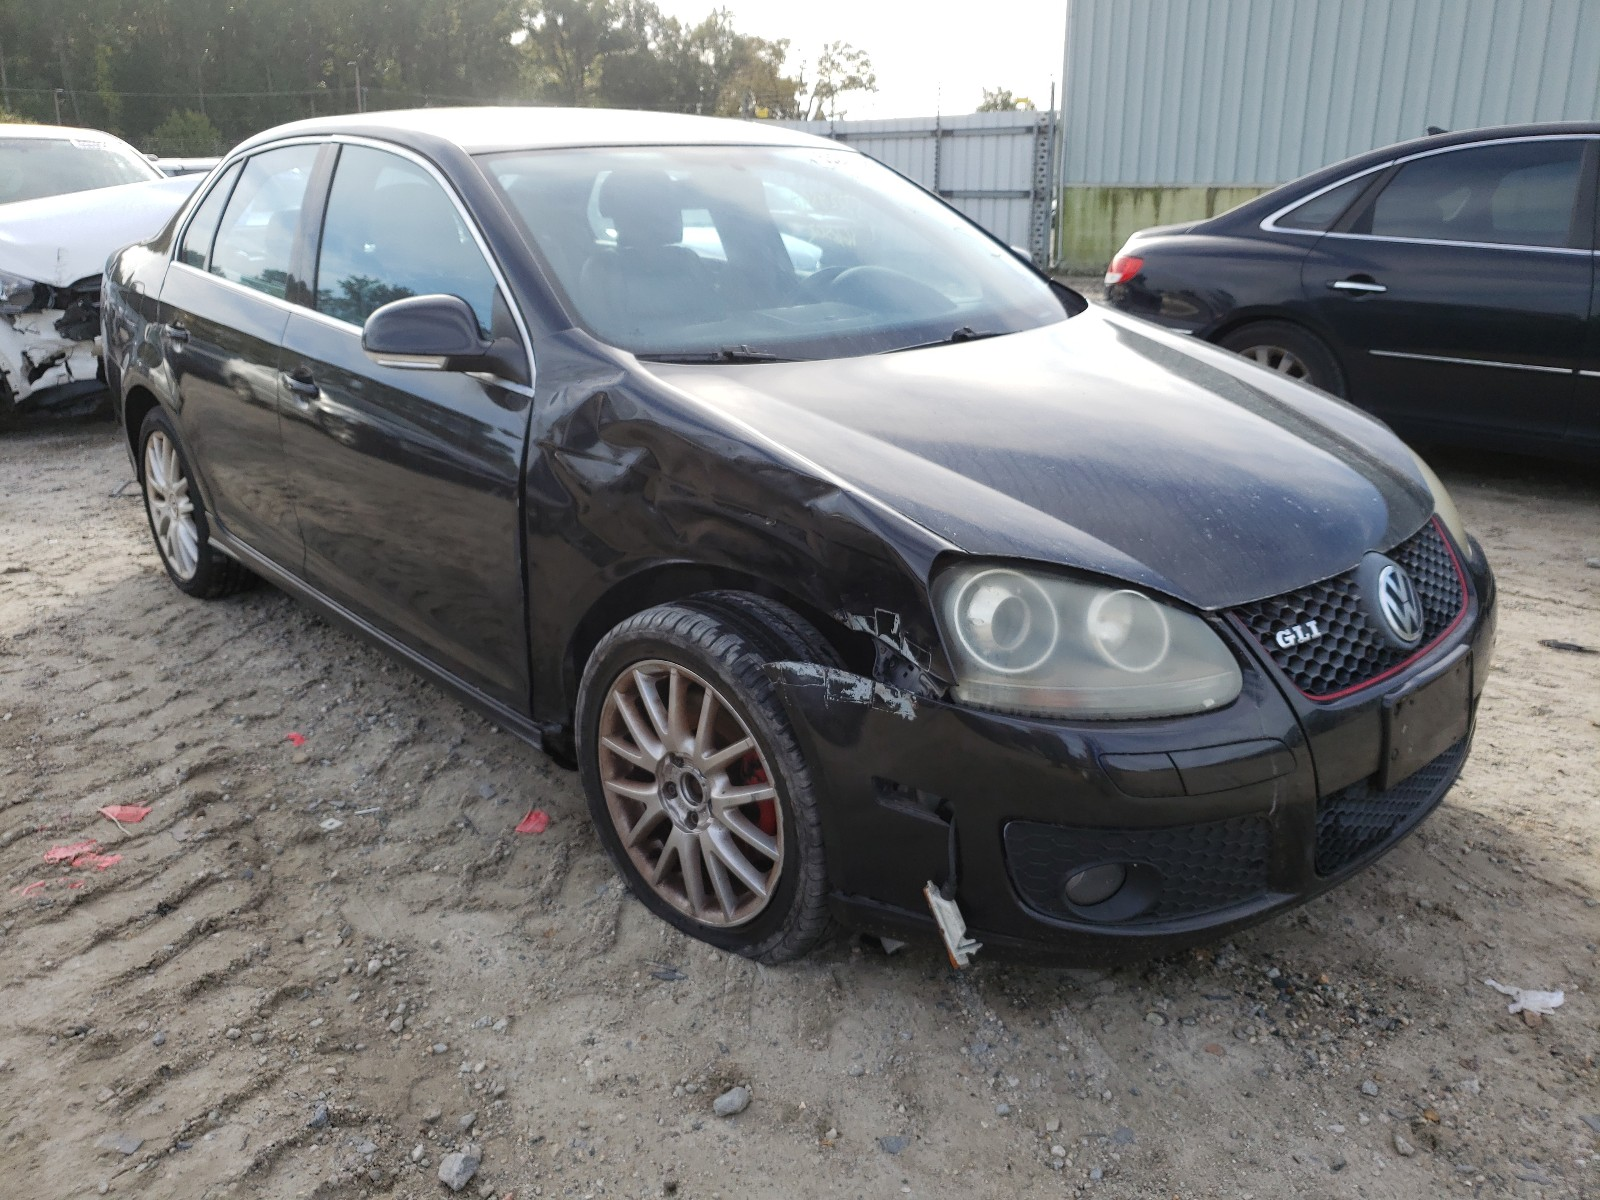 2006 Volkswagen Jetta Gli For Sale At Copart Hampton Va Lot 53229590 Salvagereseller Com